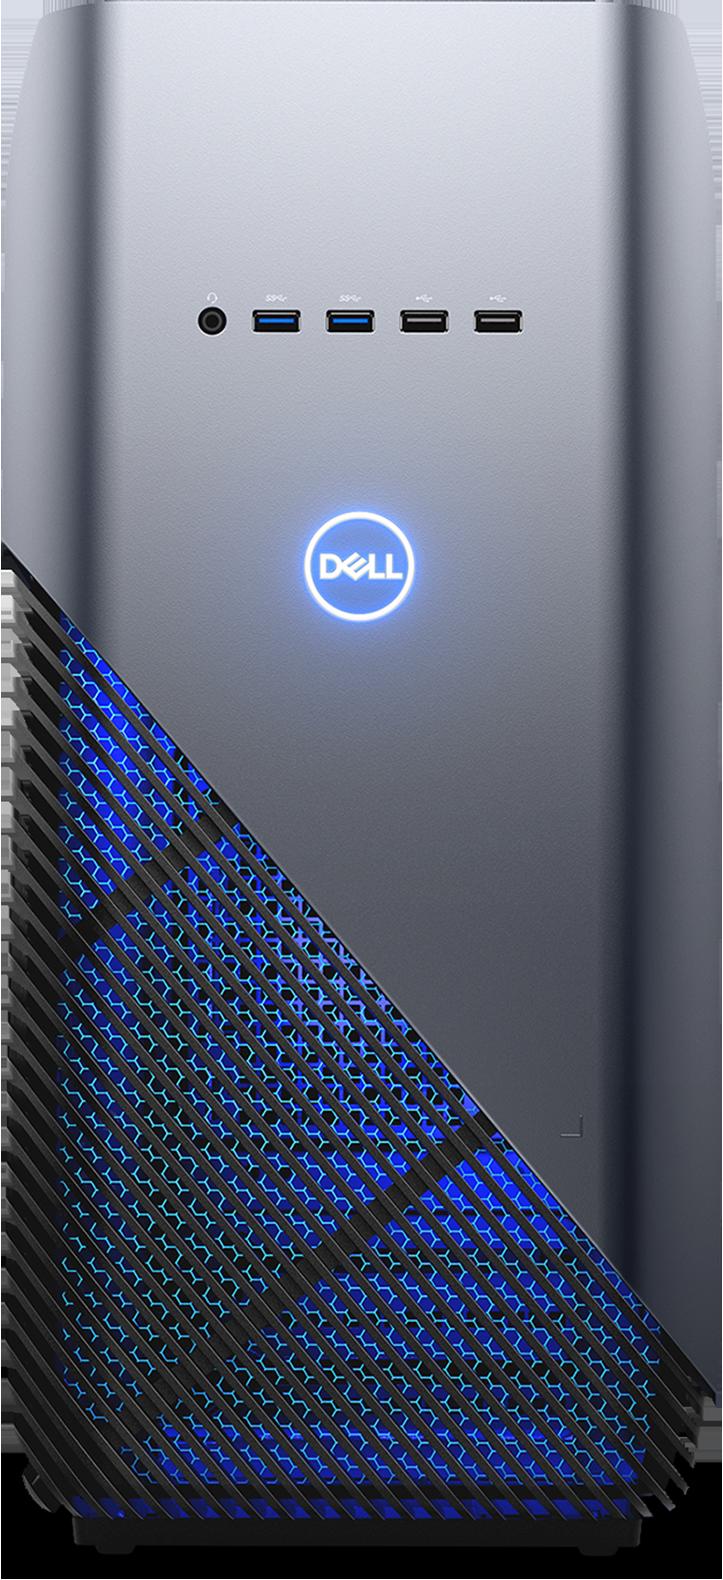 Buy Dell Inspiron 5680 Gaming Desktop - Microsoft Store